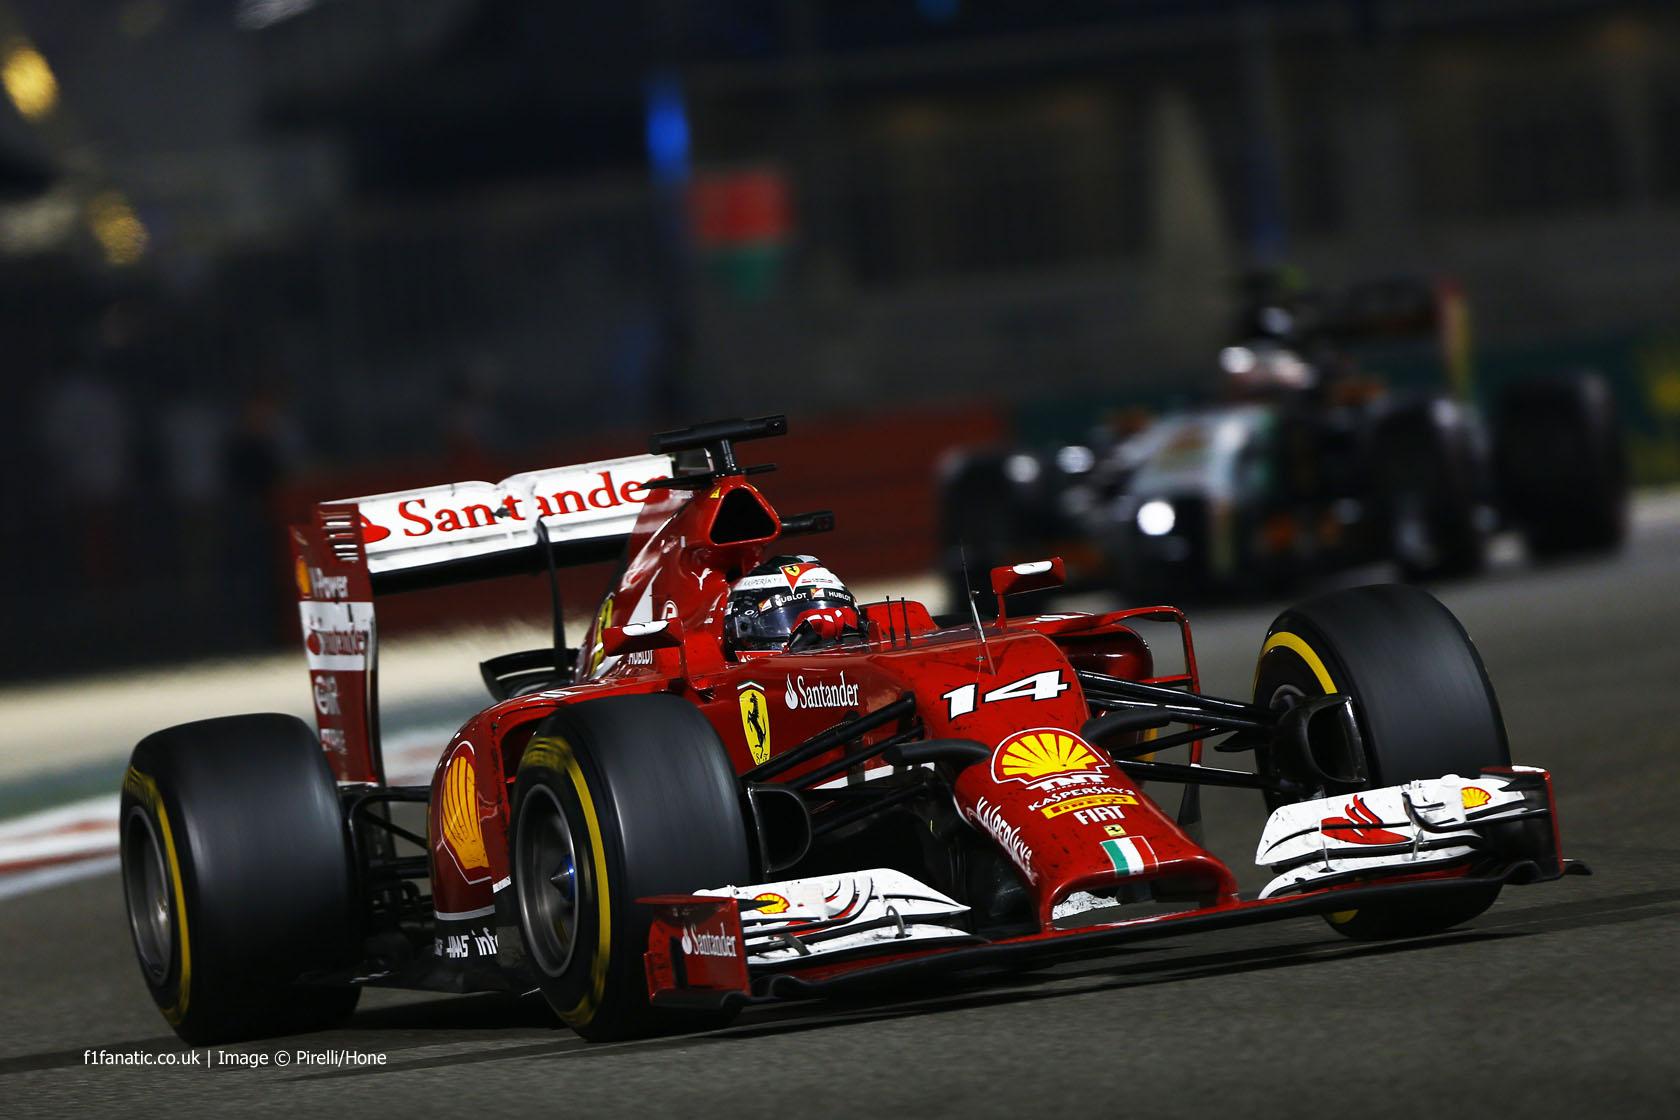 Fernando Alonso, Ferrari, Yas Marina, 2014